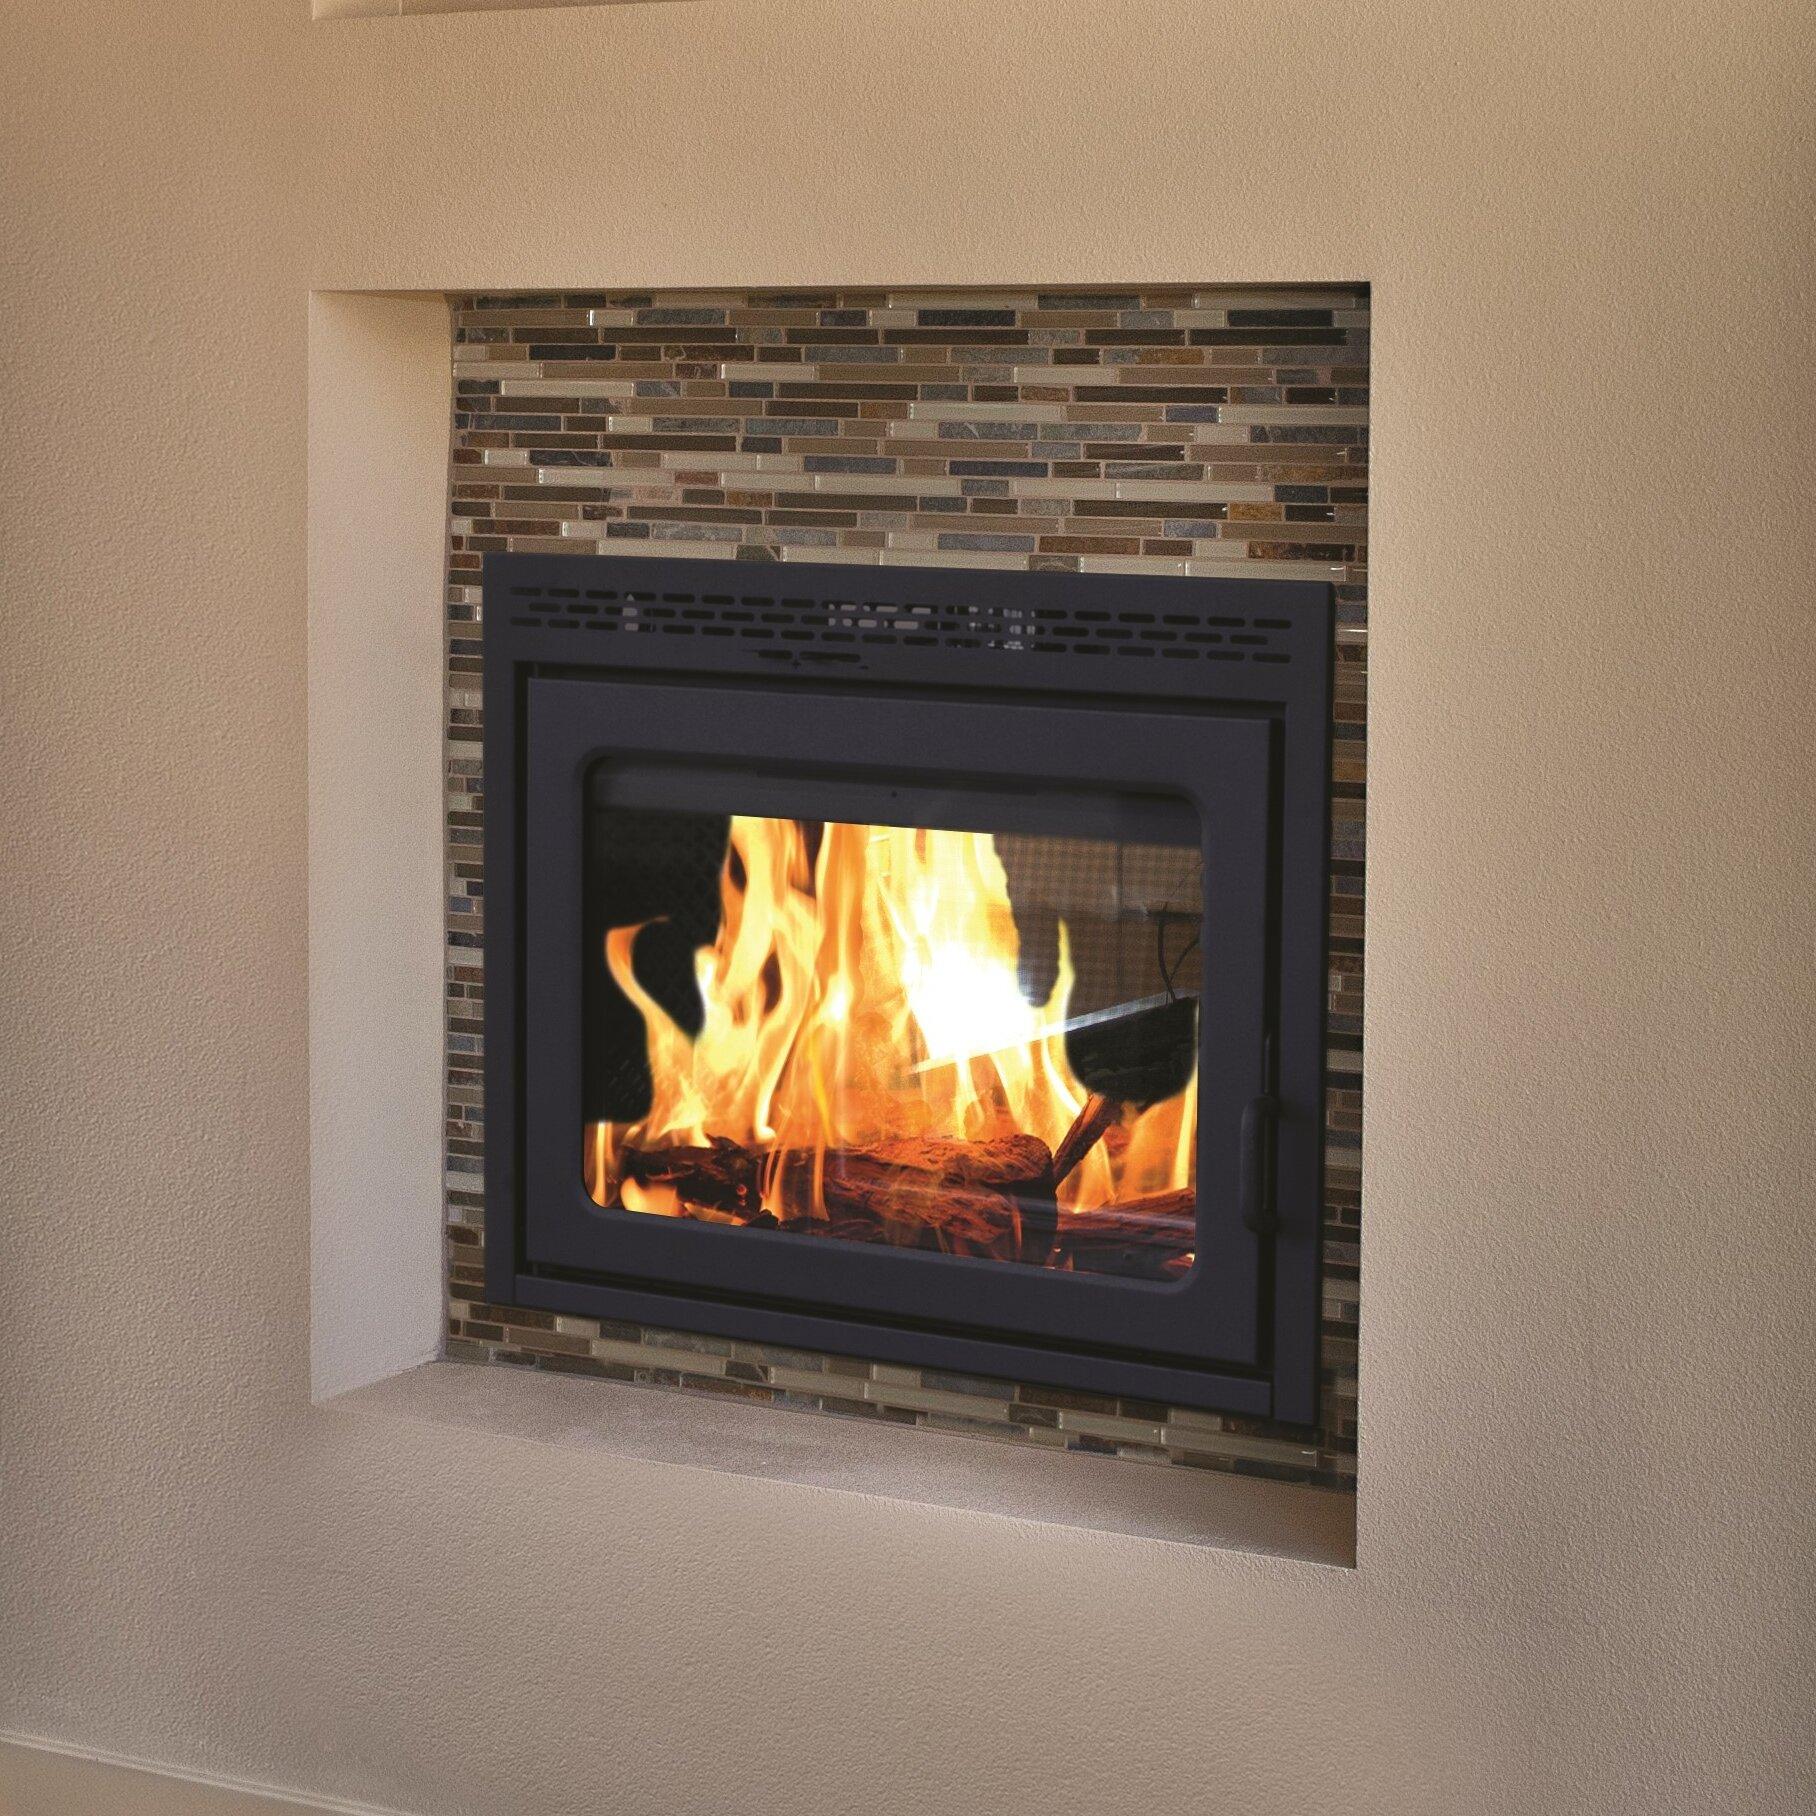 Supreme Fireplaces Inc Duet See Through Fireplace Wayfair